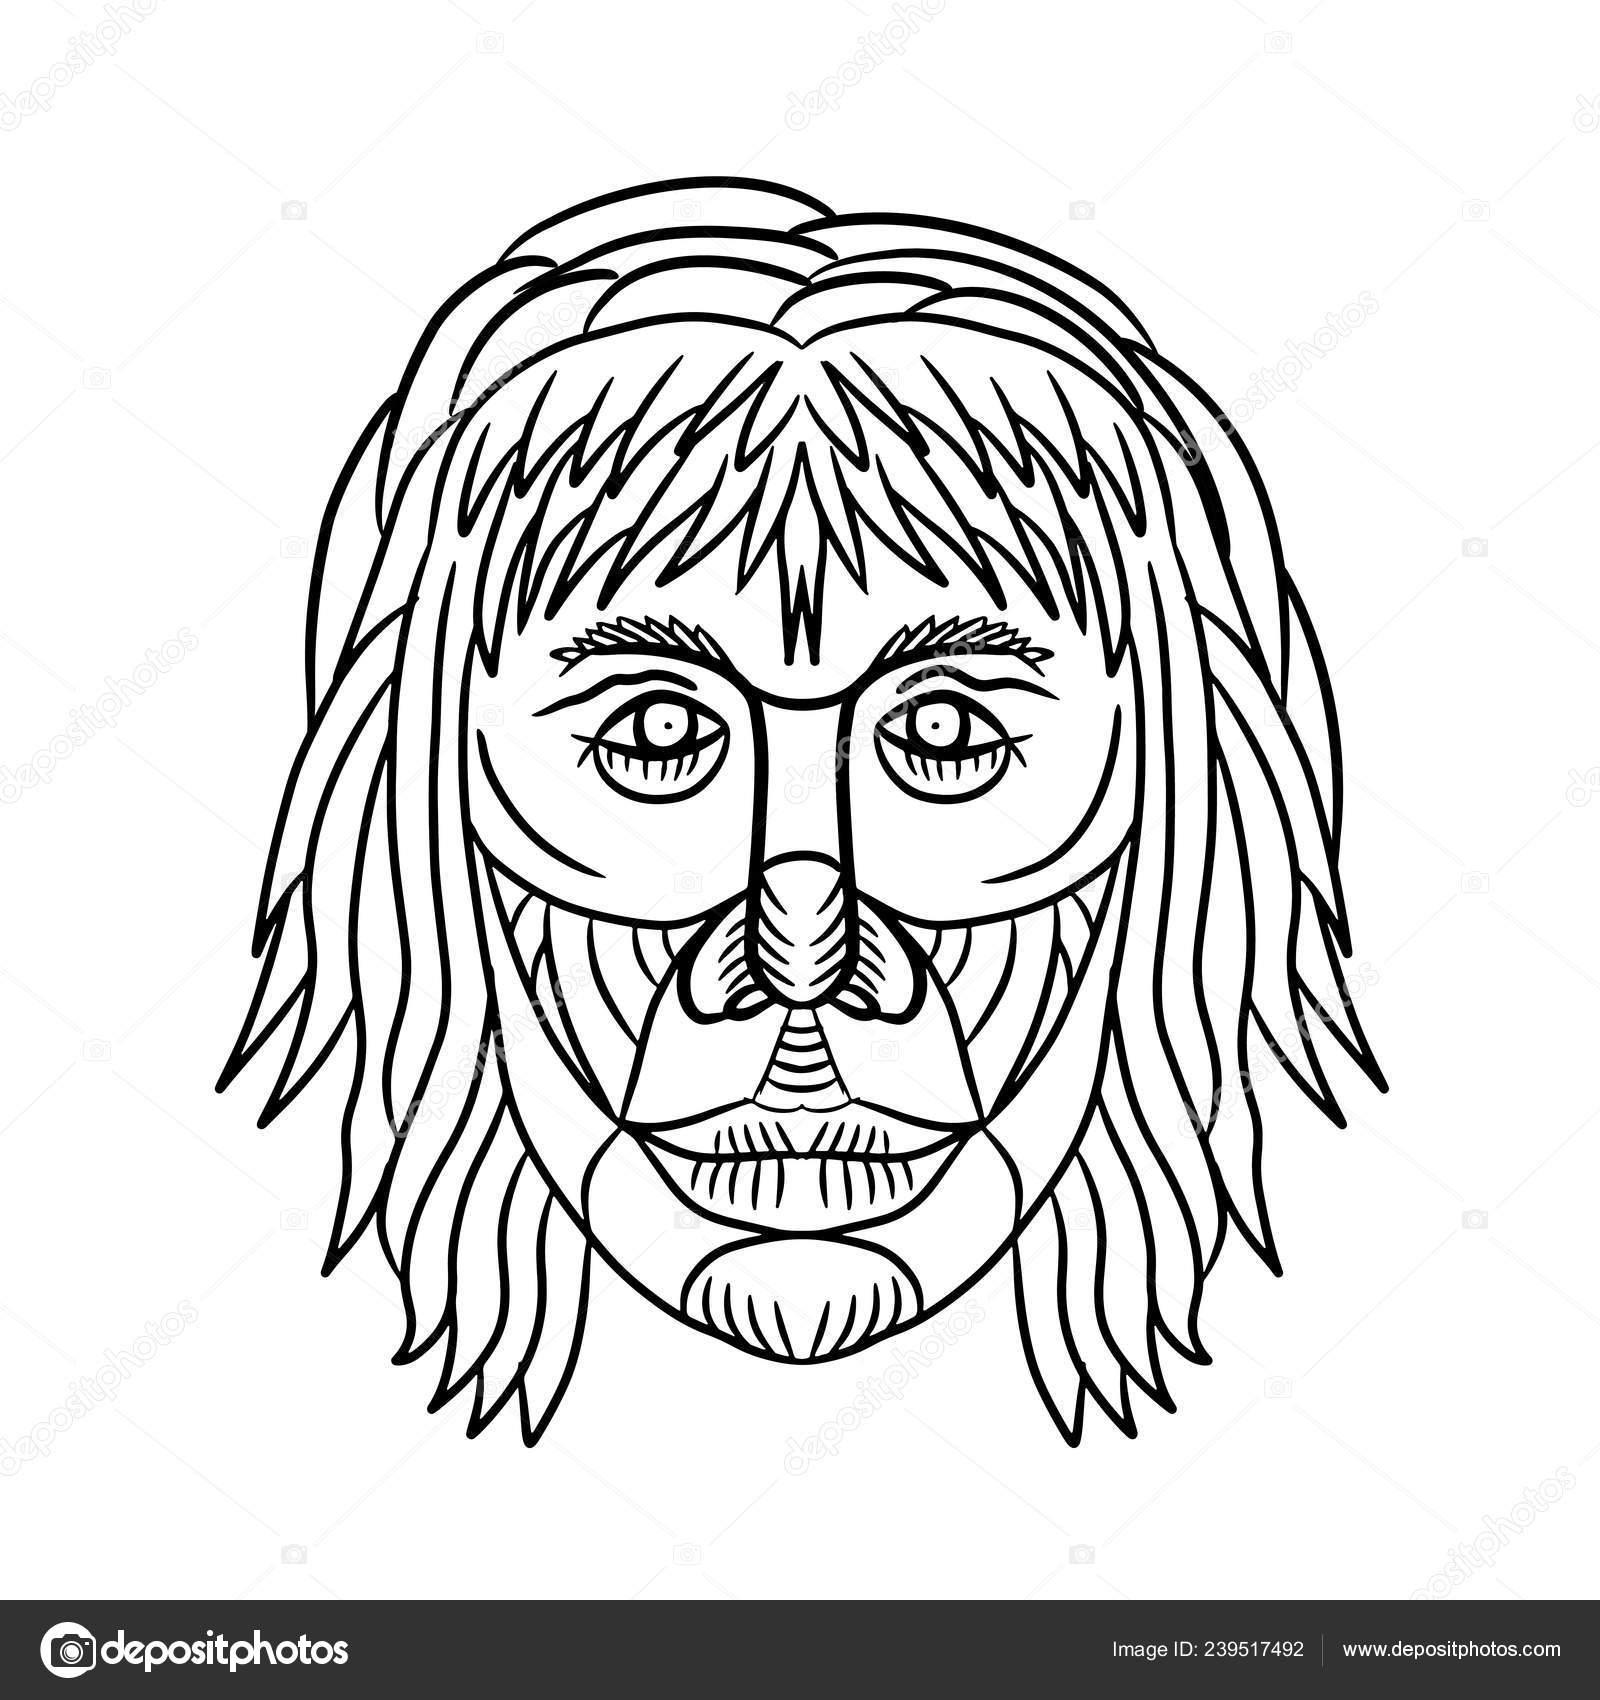 Dessin Croquis Style Illustration Visage Homo Habilis Des